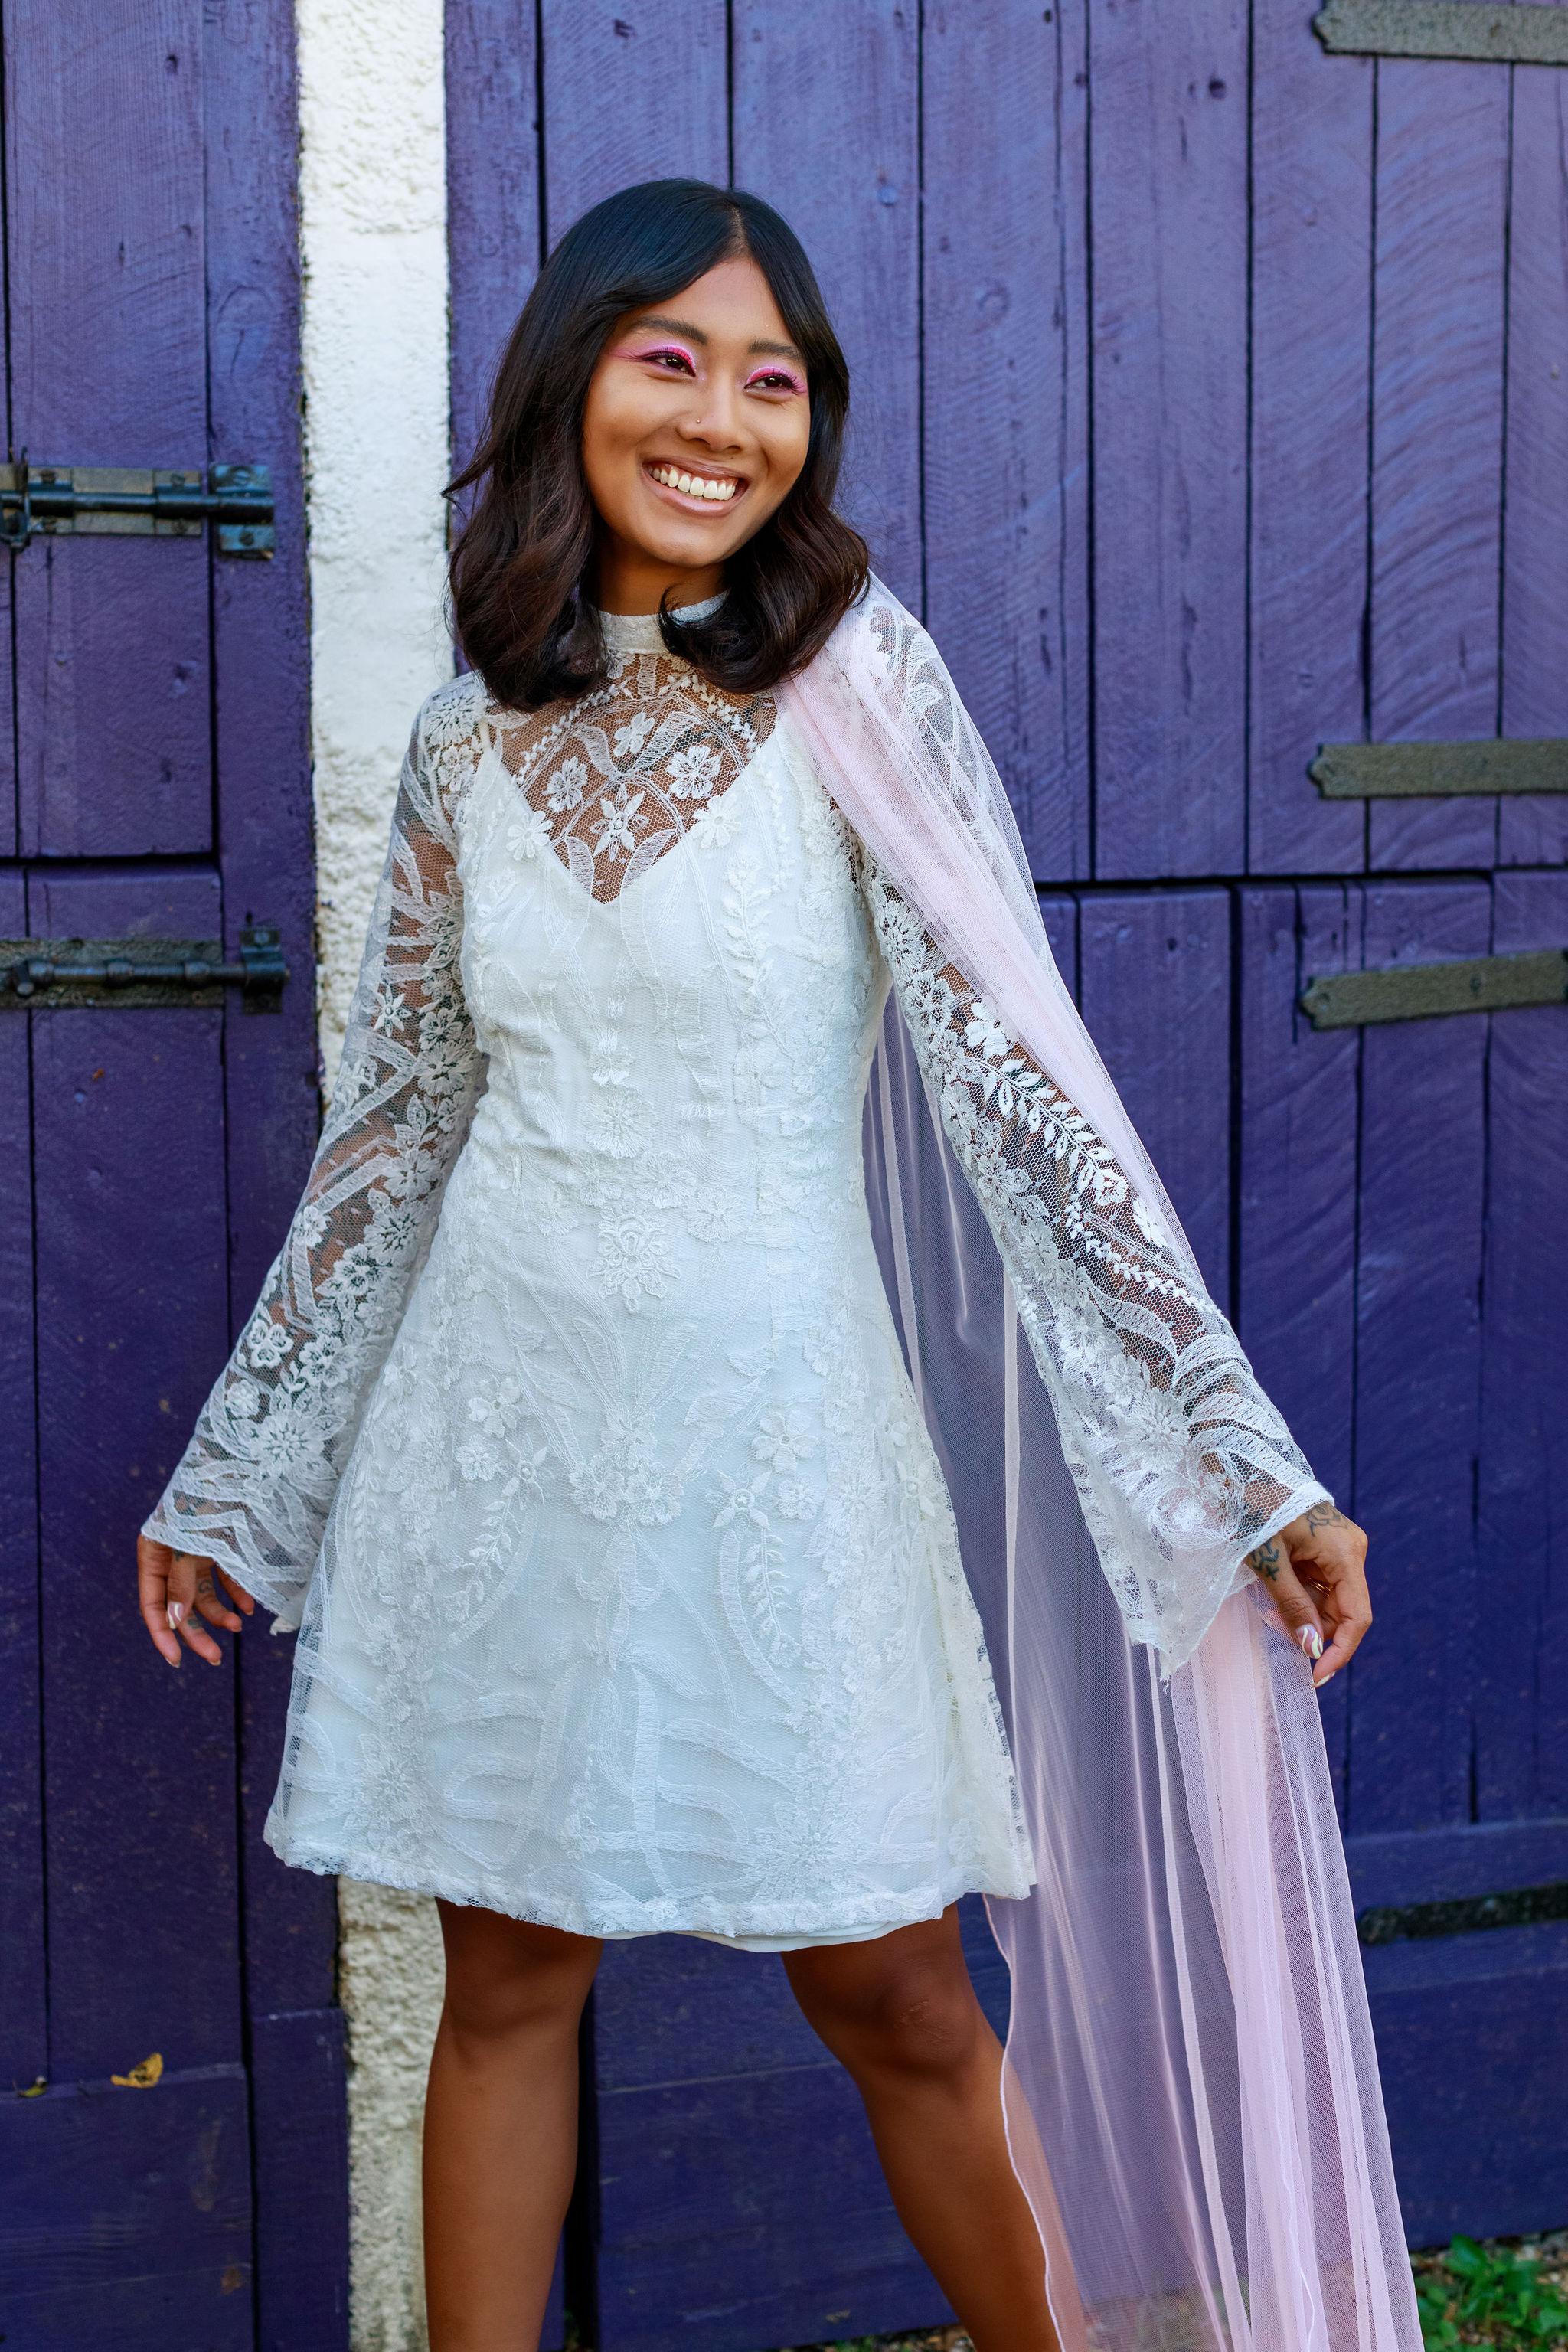 Favourite Lucy Can't Dance unique alternative wedding dress blog - wildflower new bridalwear range 1 - short wedding dress with ombre pink wedding veil